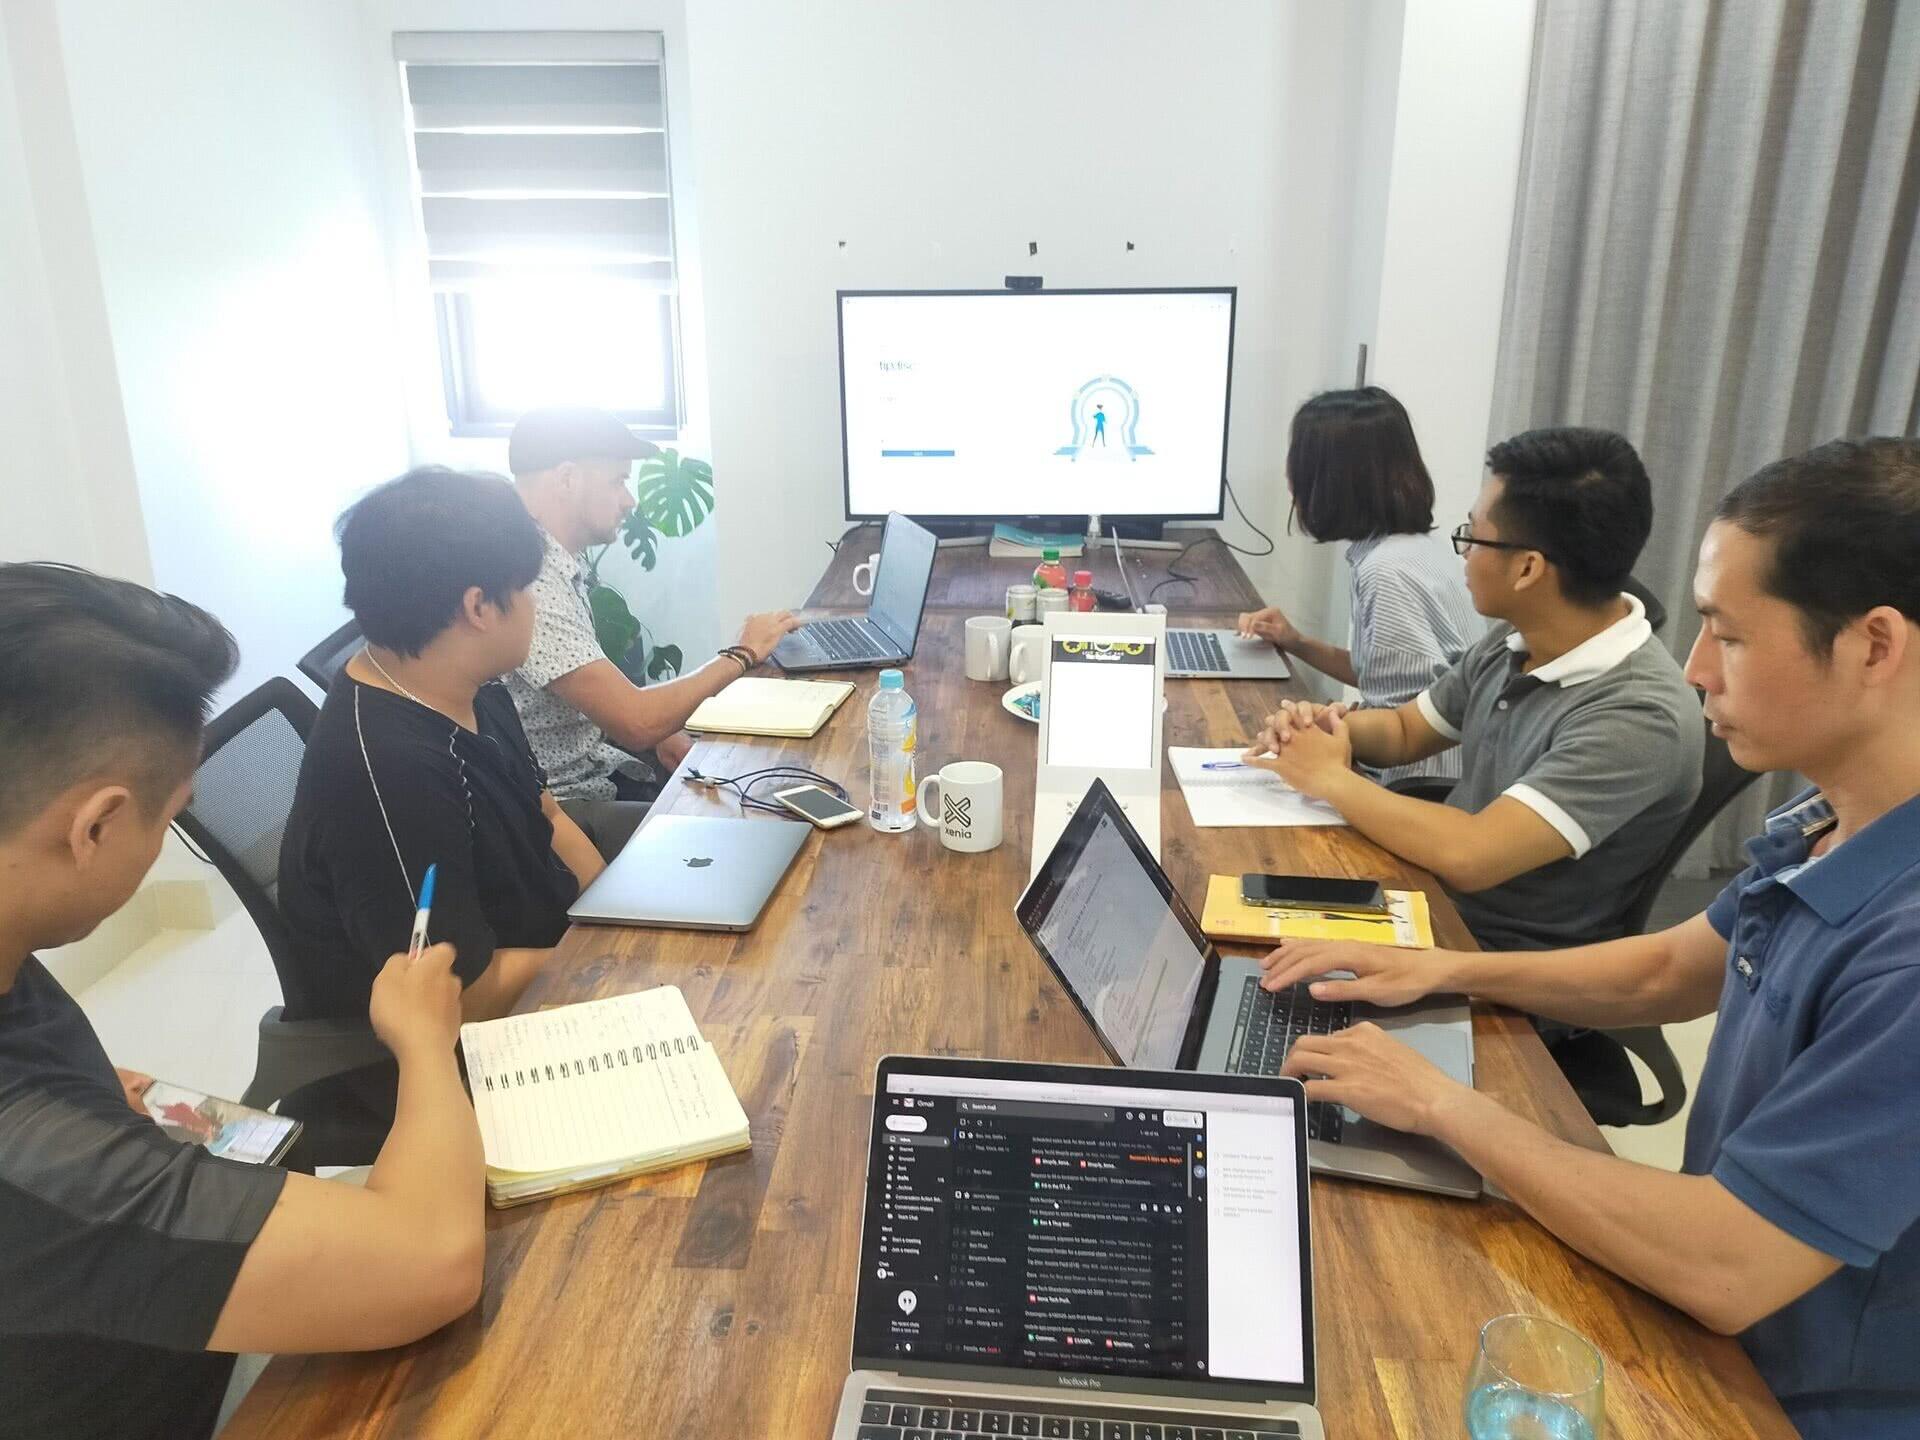 Tipdisc - Brainstorming Meeting